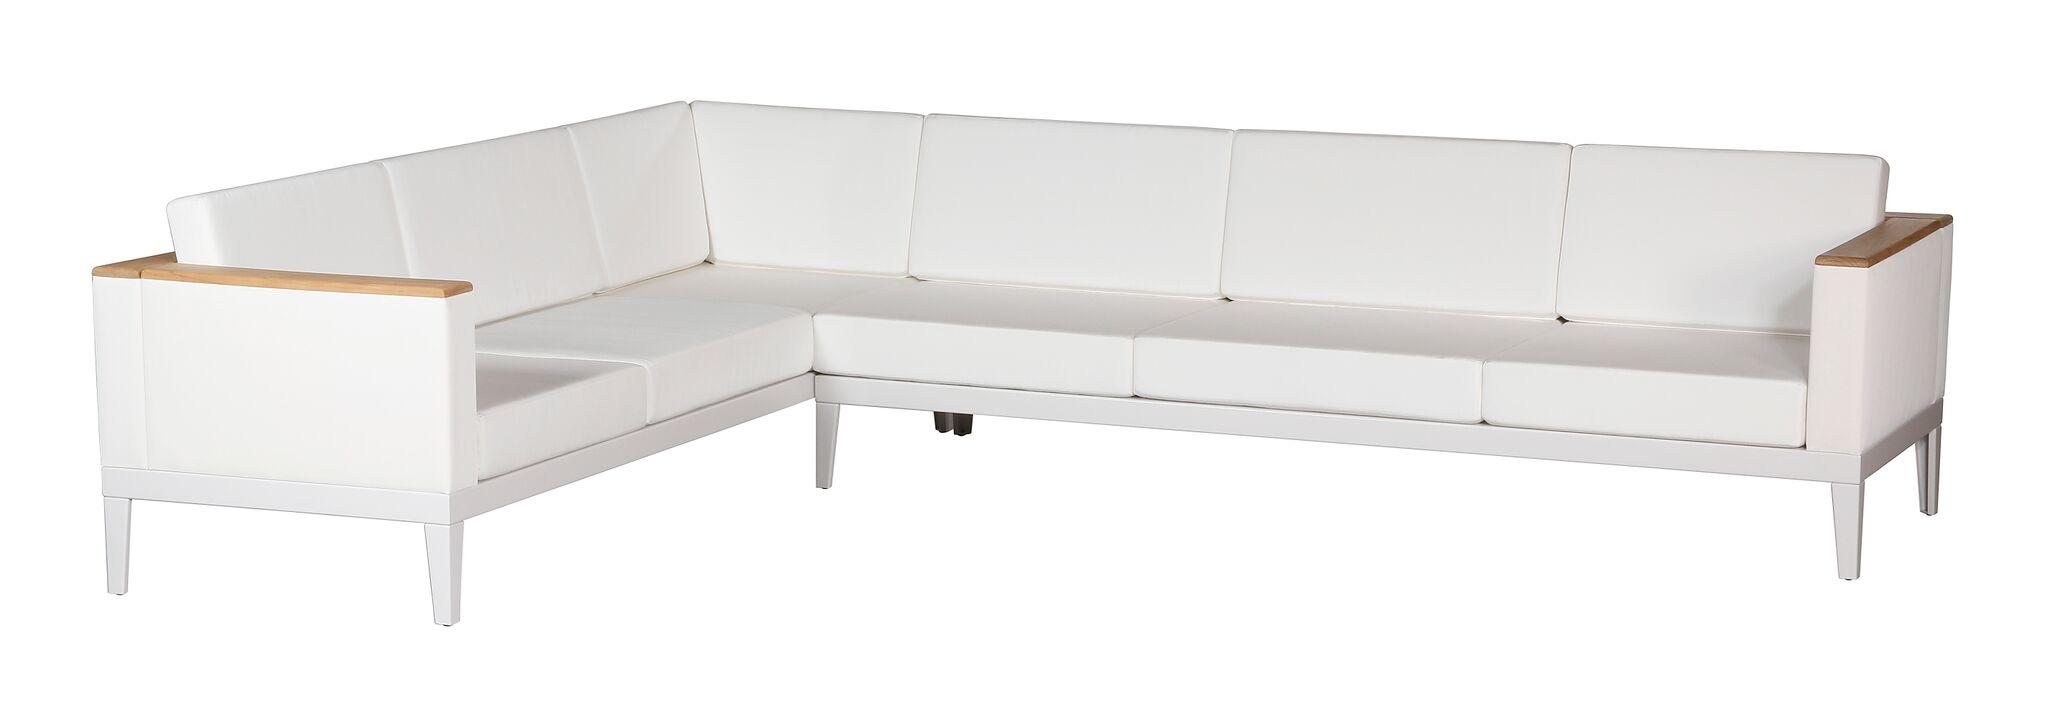 Barlow Tyrie Aura Deep Seating Six Seater Corner Sectional Set